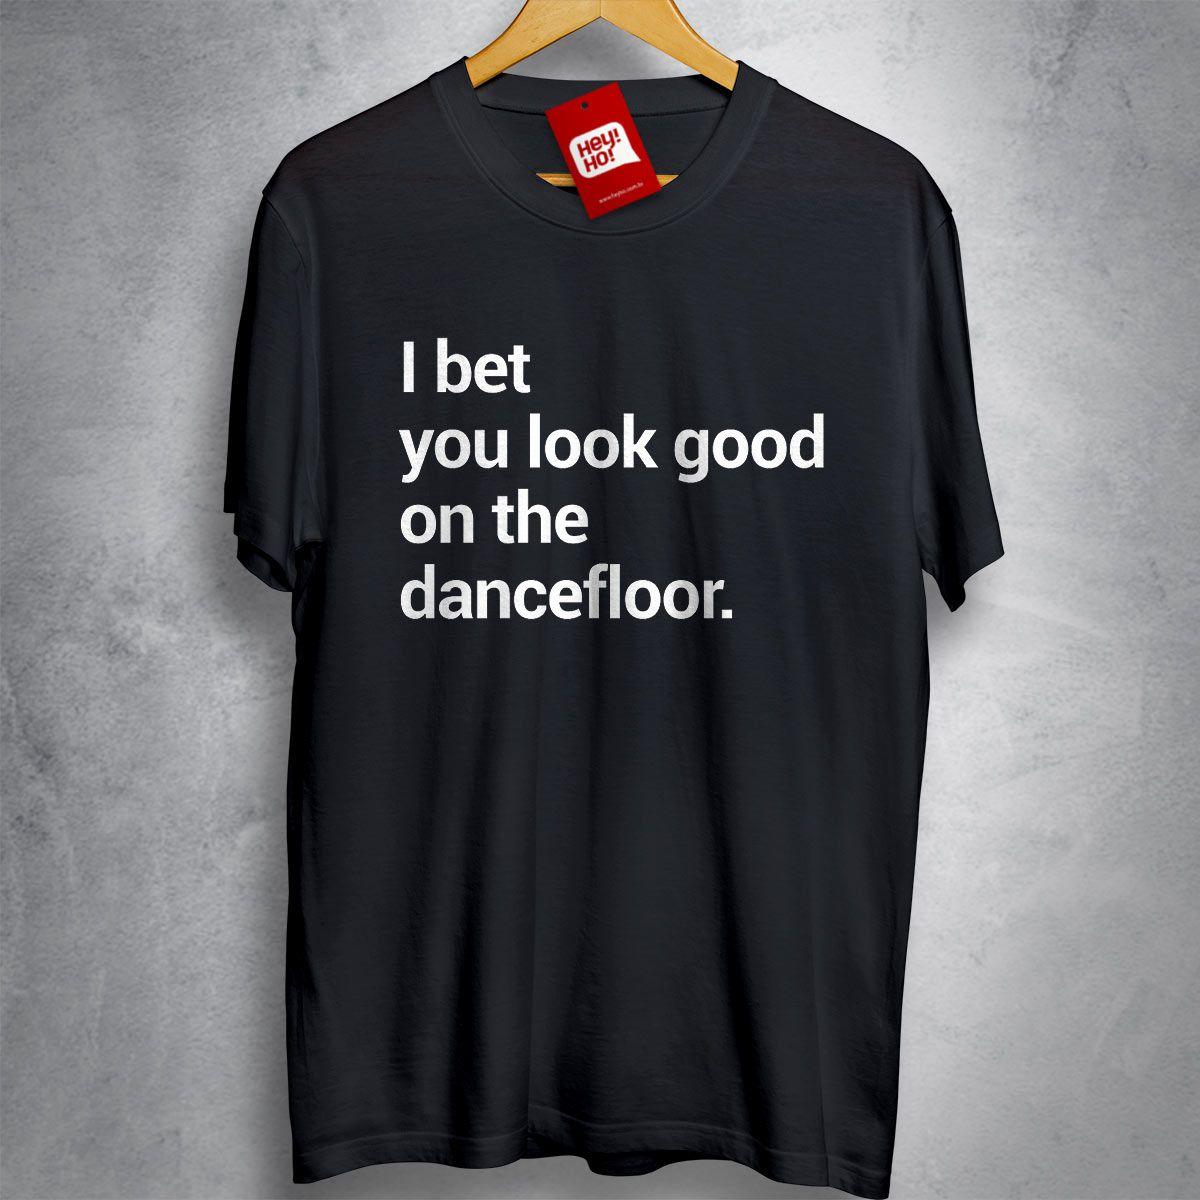 OFERTA - ARCTIC MONKEYS - I bet you look good on the dancefloor - CAMISETA PRETA - Tamanho P